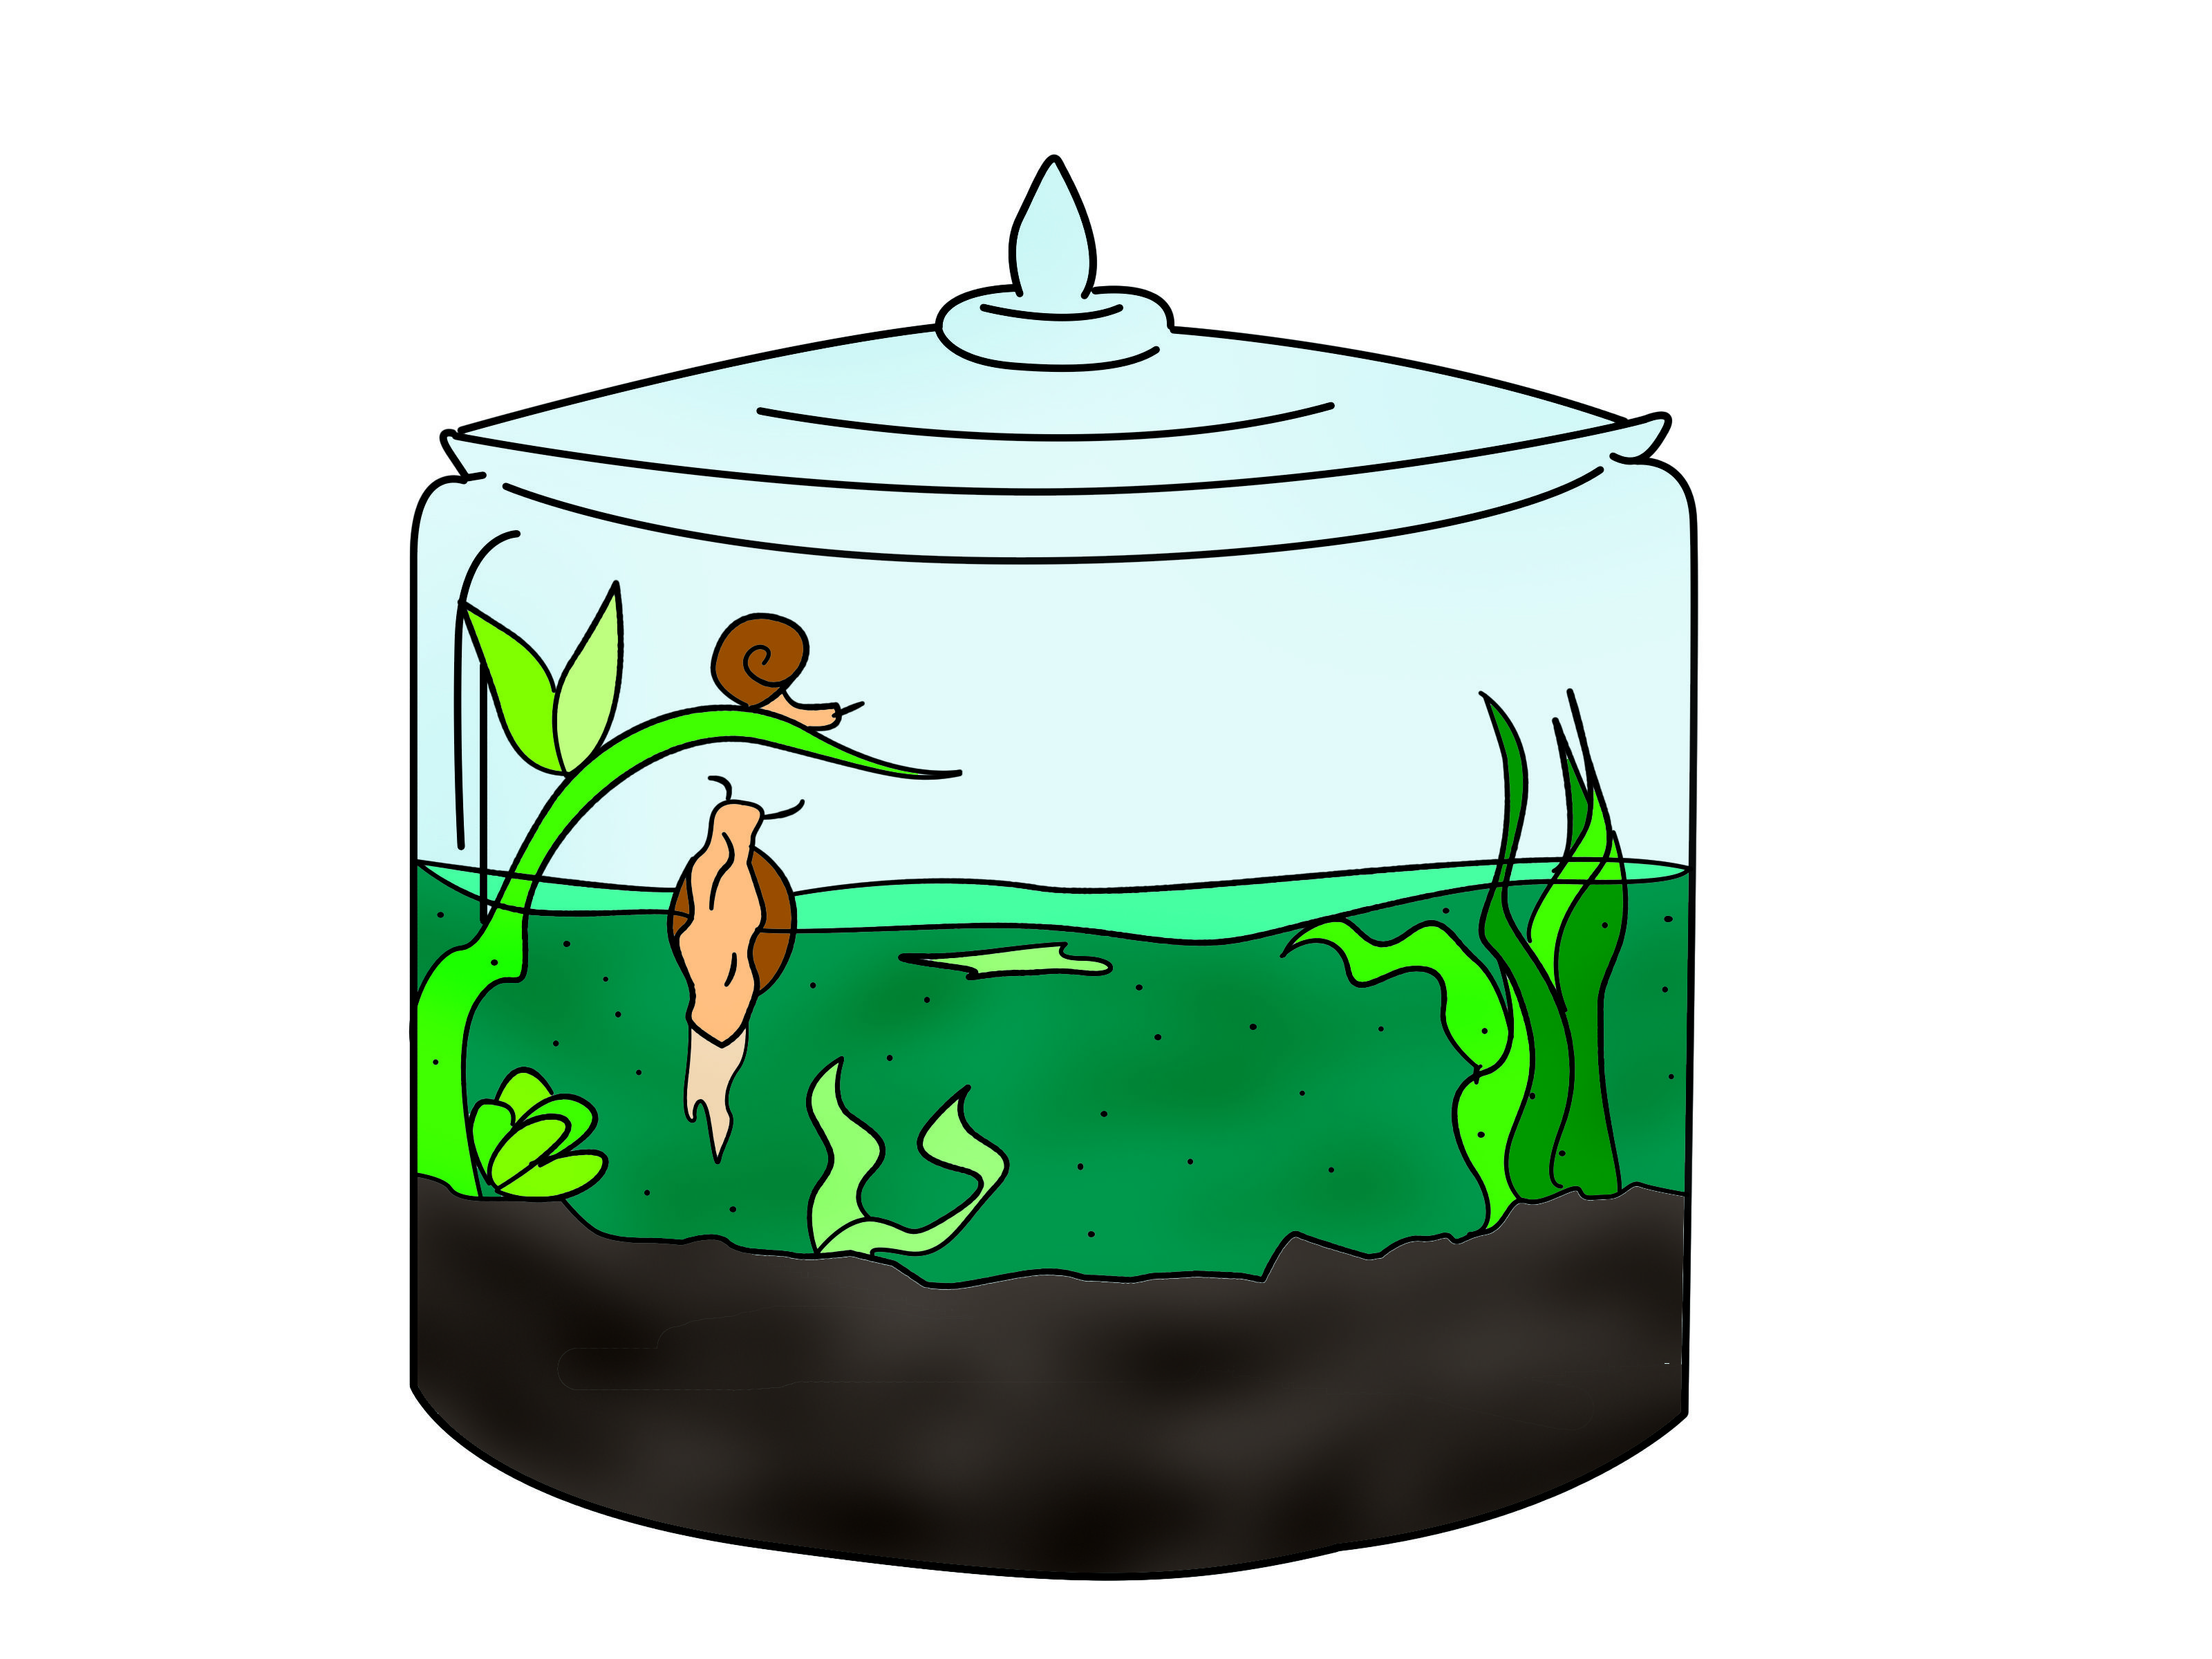 Freshwater aquarium fish ecosystem - Build A Self Sustaining Ecosystem